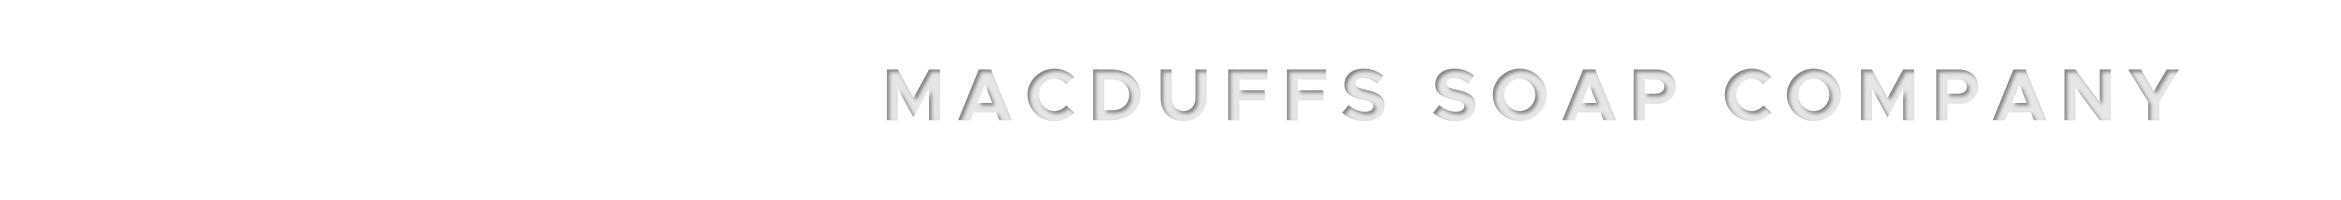 MacDuff's Soap Company